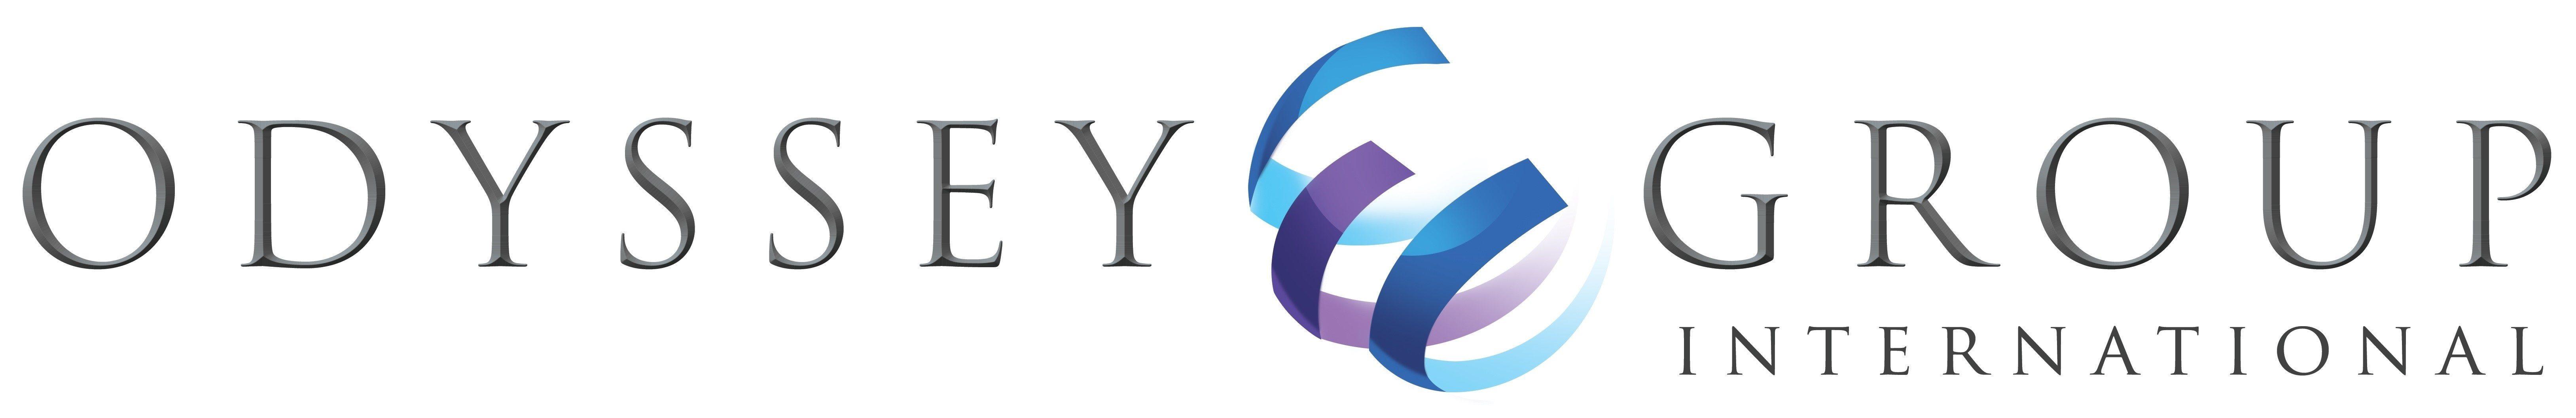 Odyssey Group International, Inc.